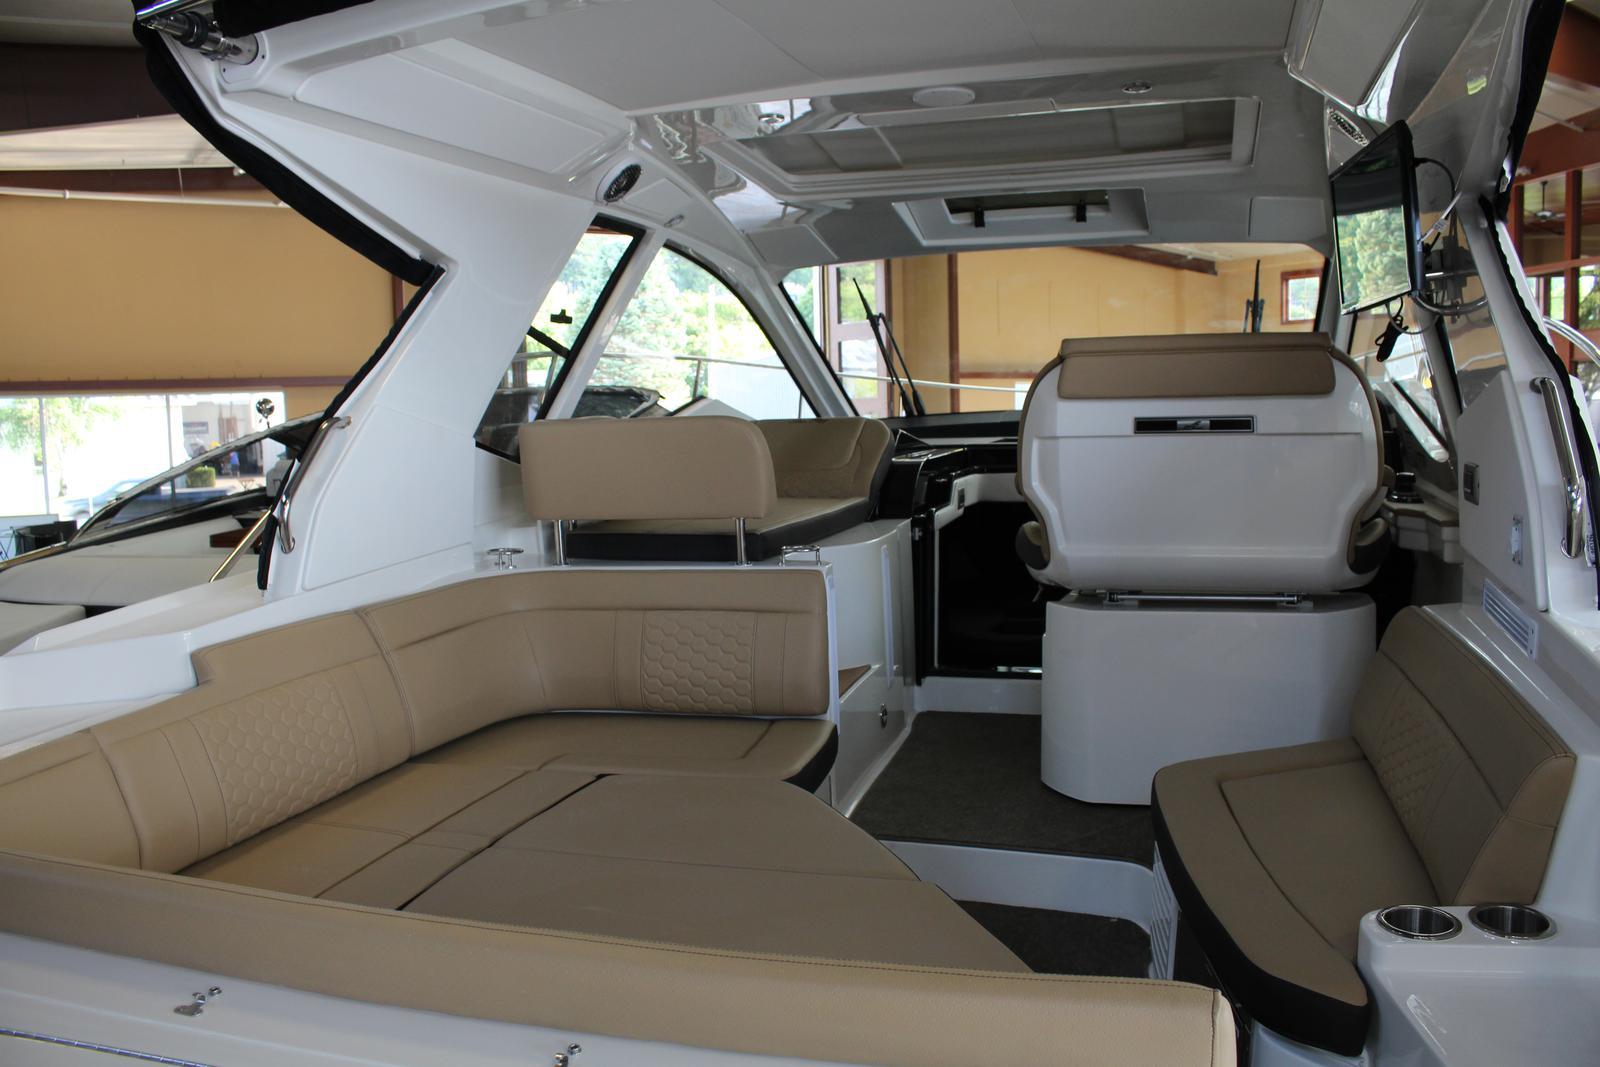 2018 Sea Ray Sundancer 350 Coupe For Sale In Harbor Springs Mi